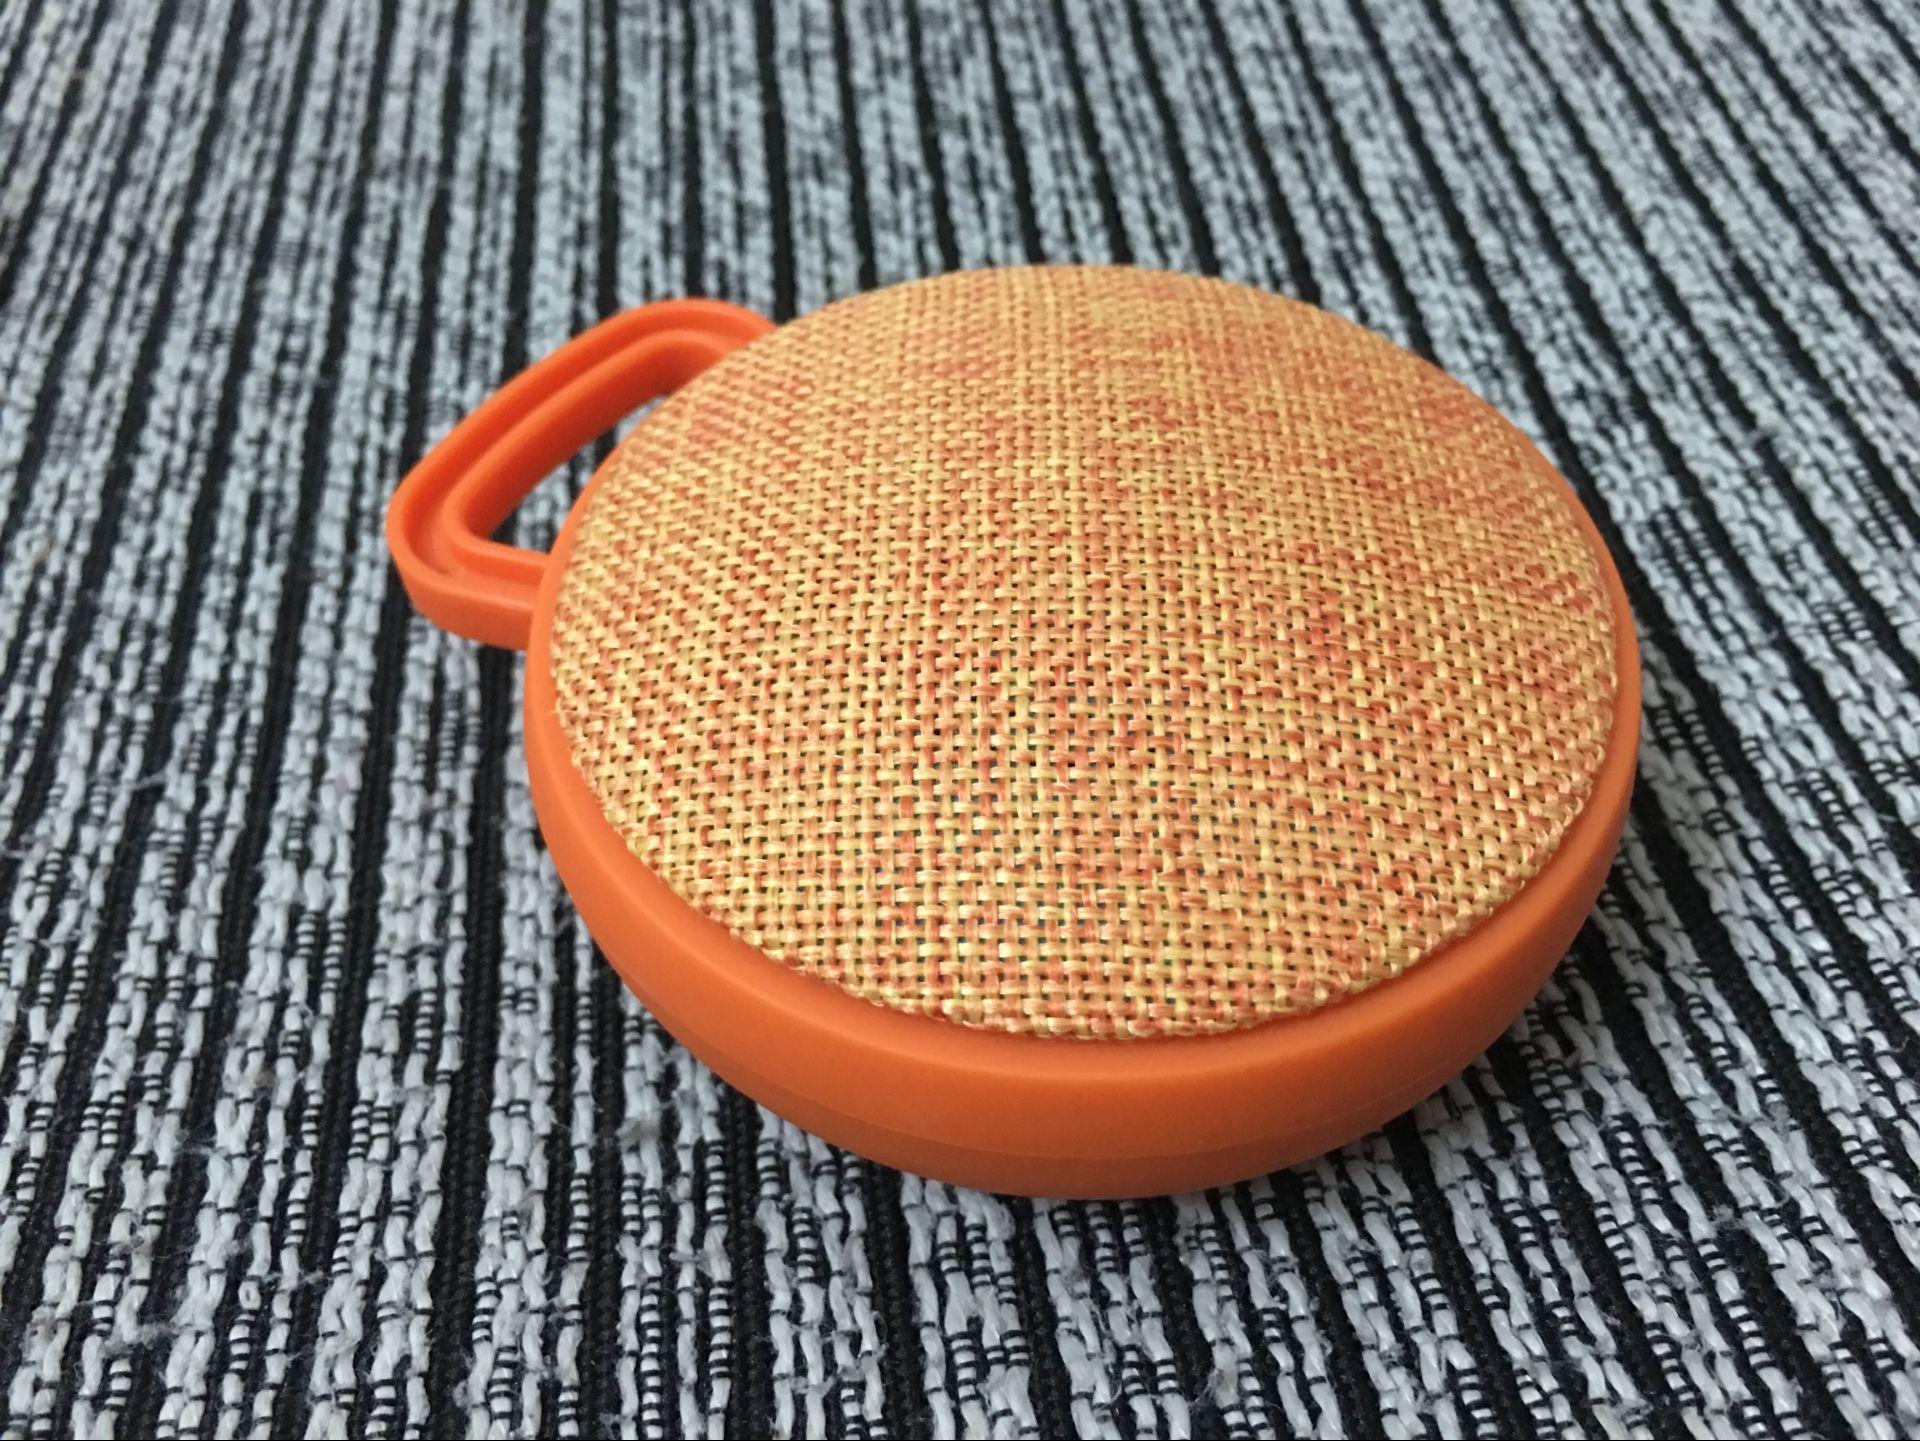 Unique Chic Circular Fabric Art Speaker Wireless Bluetooth Portable Hook Subwoofer  Orange